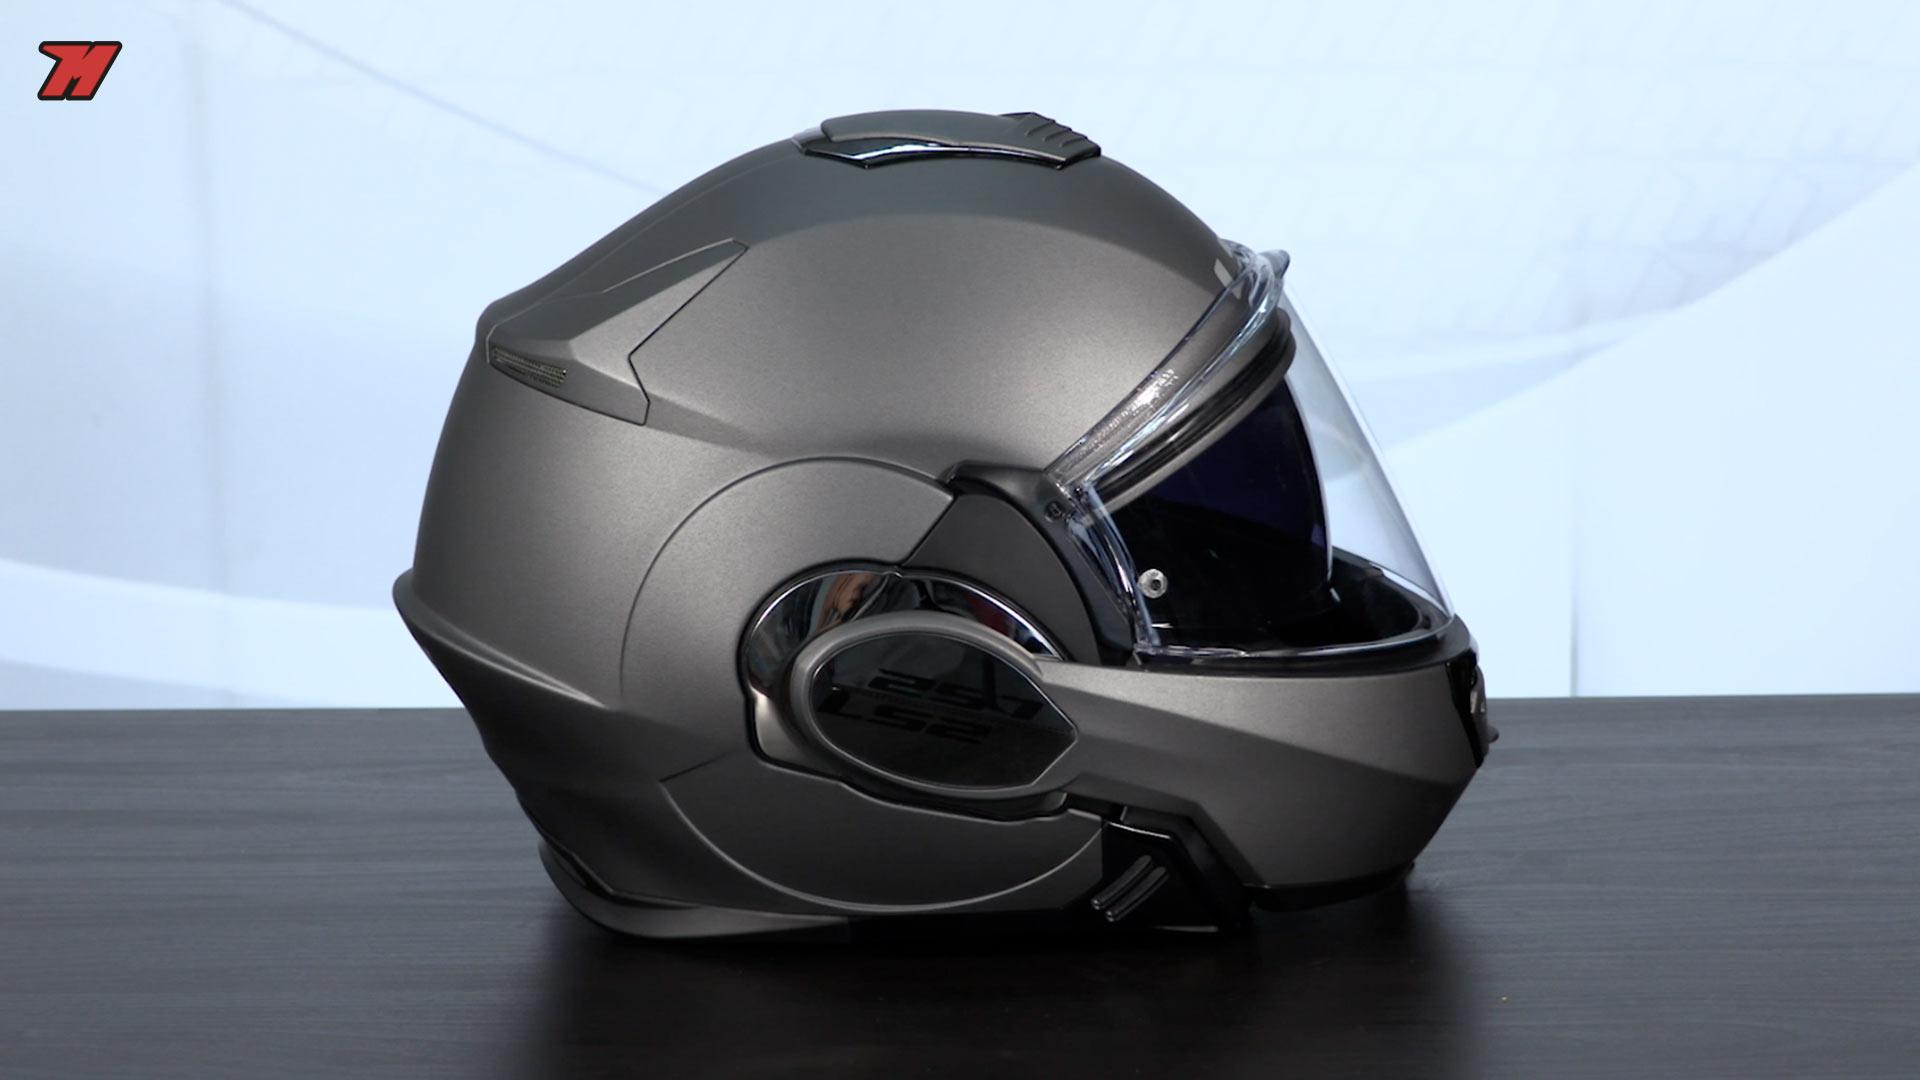 review ls2 ff399 valiant the most popular modular helmet. Black Bedroom Furniture Sets. Home Design Ideas